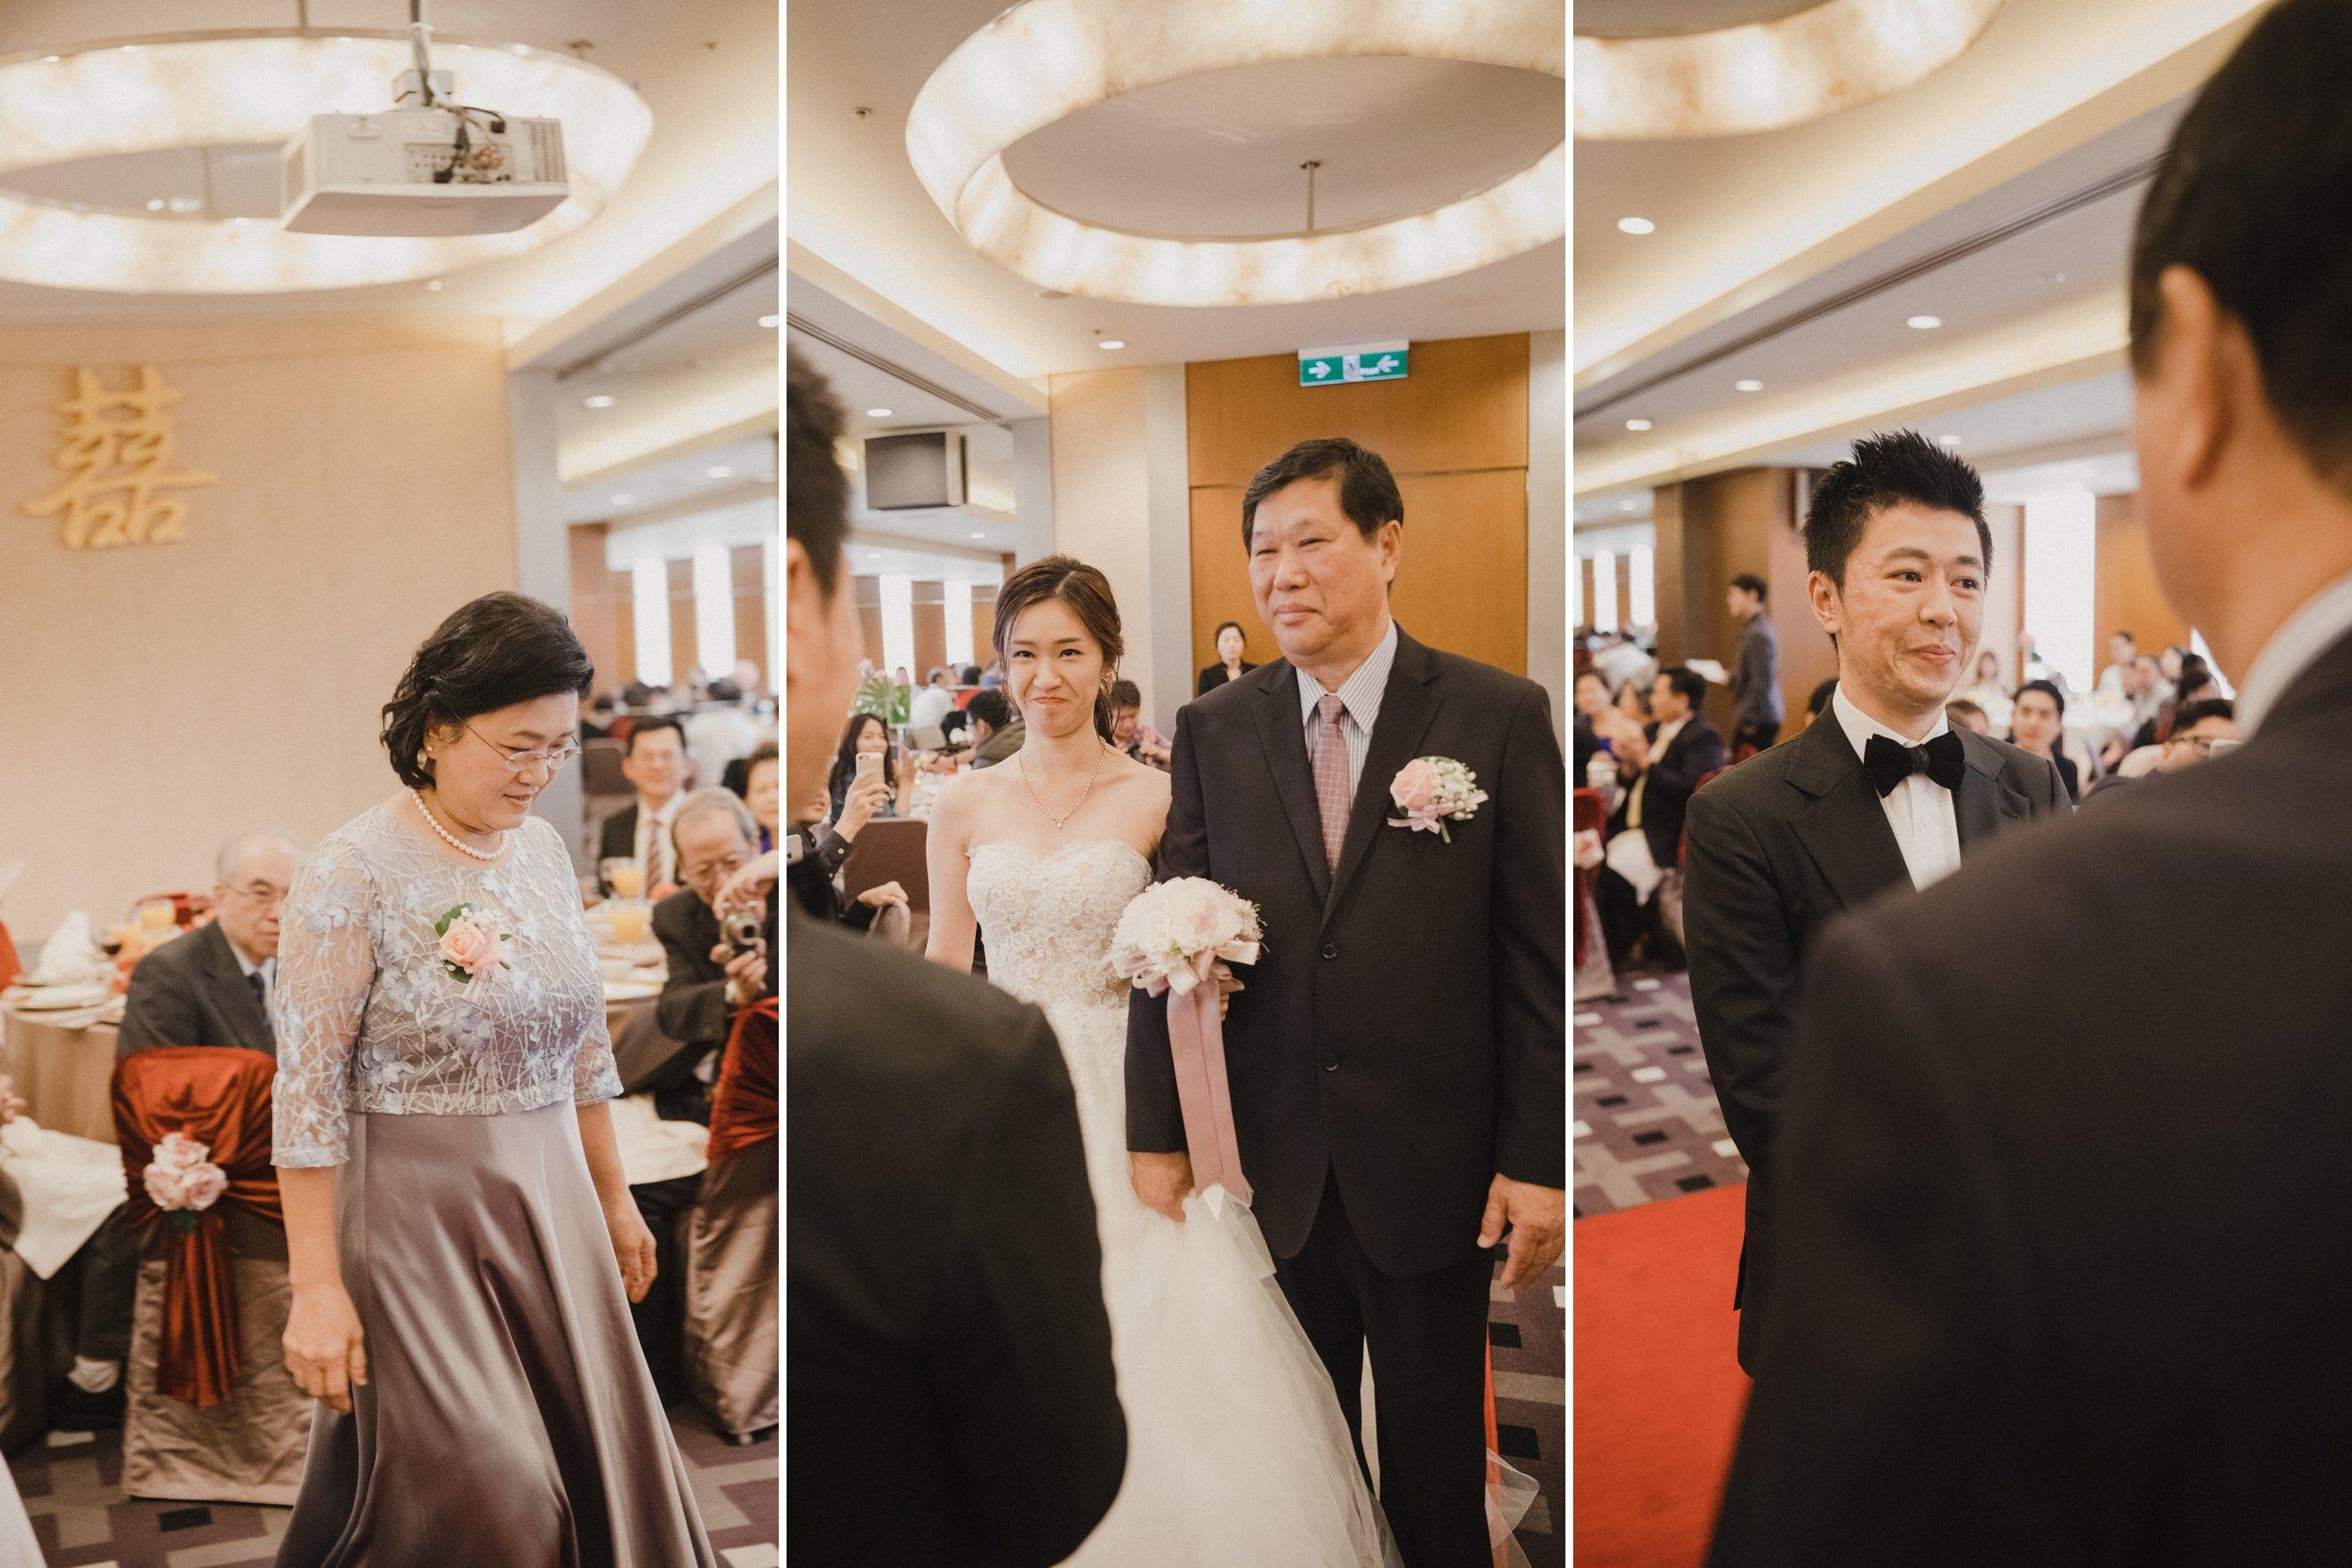 wedding-caridee-oscar-lunch-ambassador-hsinchu-結婚午宴-新竹國賓_64.jpg